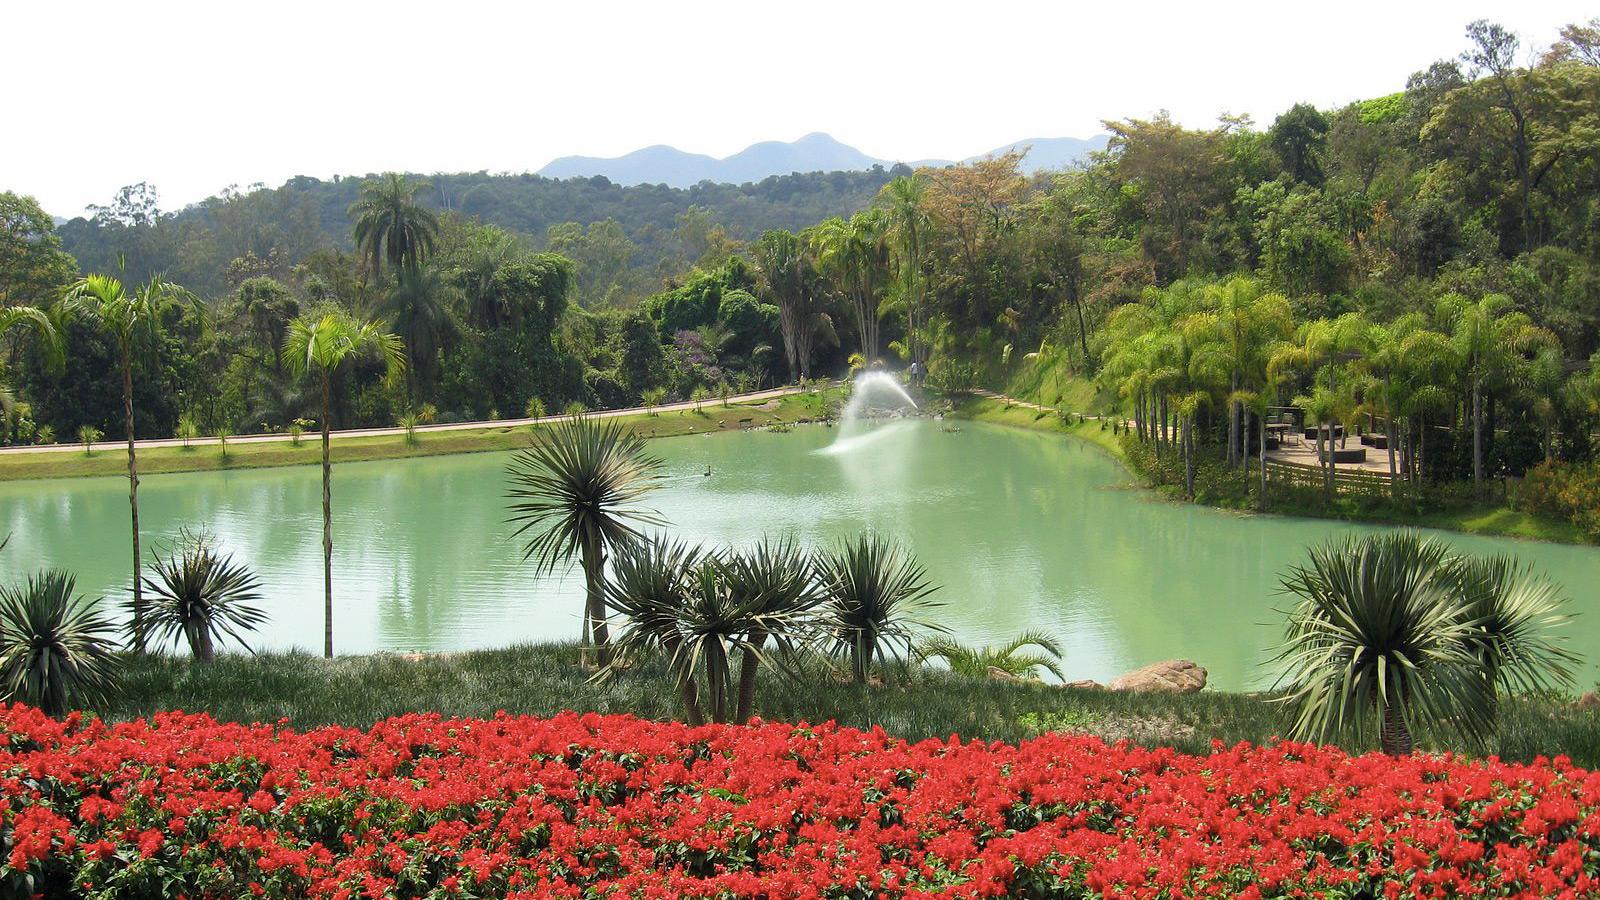 instituto-inhotim-jardim-botanico-botanical-gardens